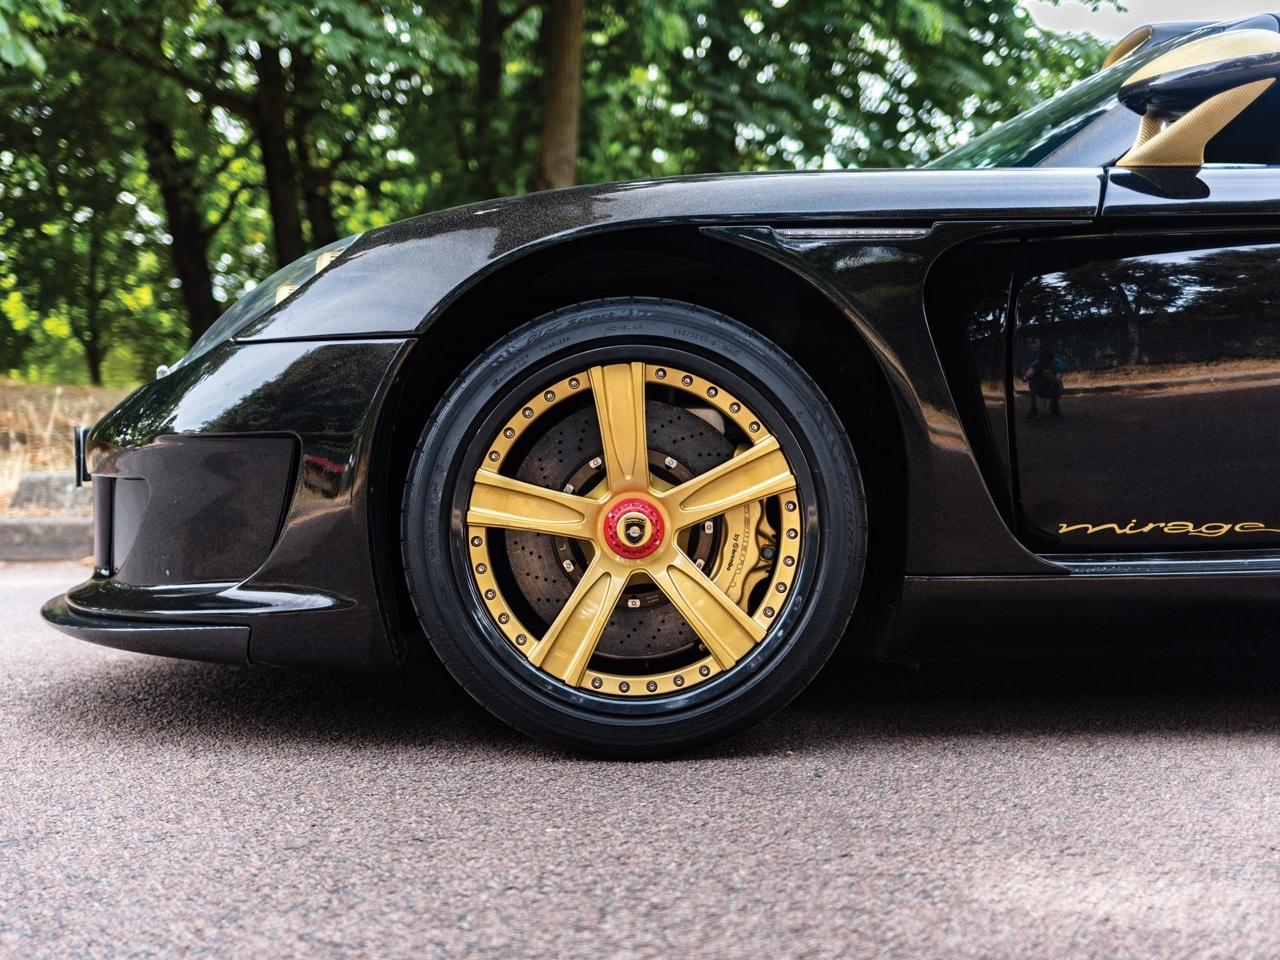 Porsche Carrera GT -> Gemballa Mirage GT Gold Edition : La caisse à Samuel ! 6